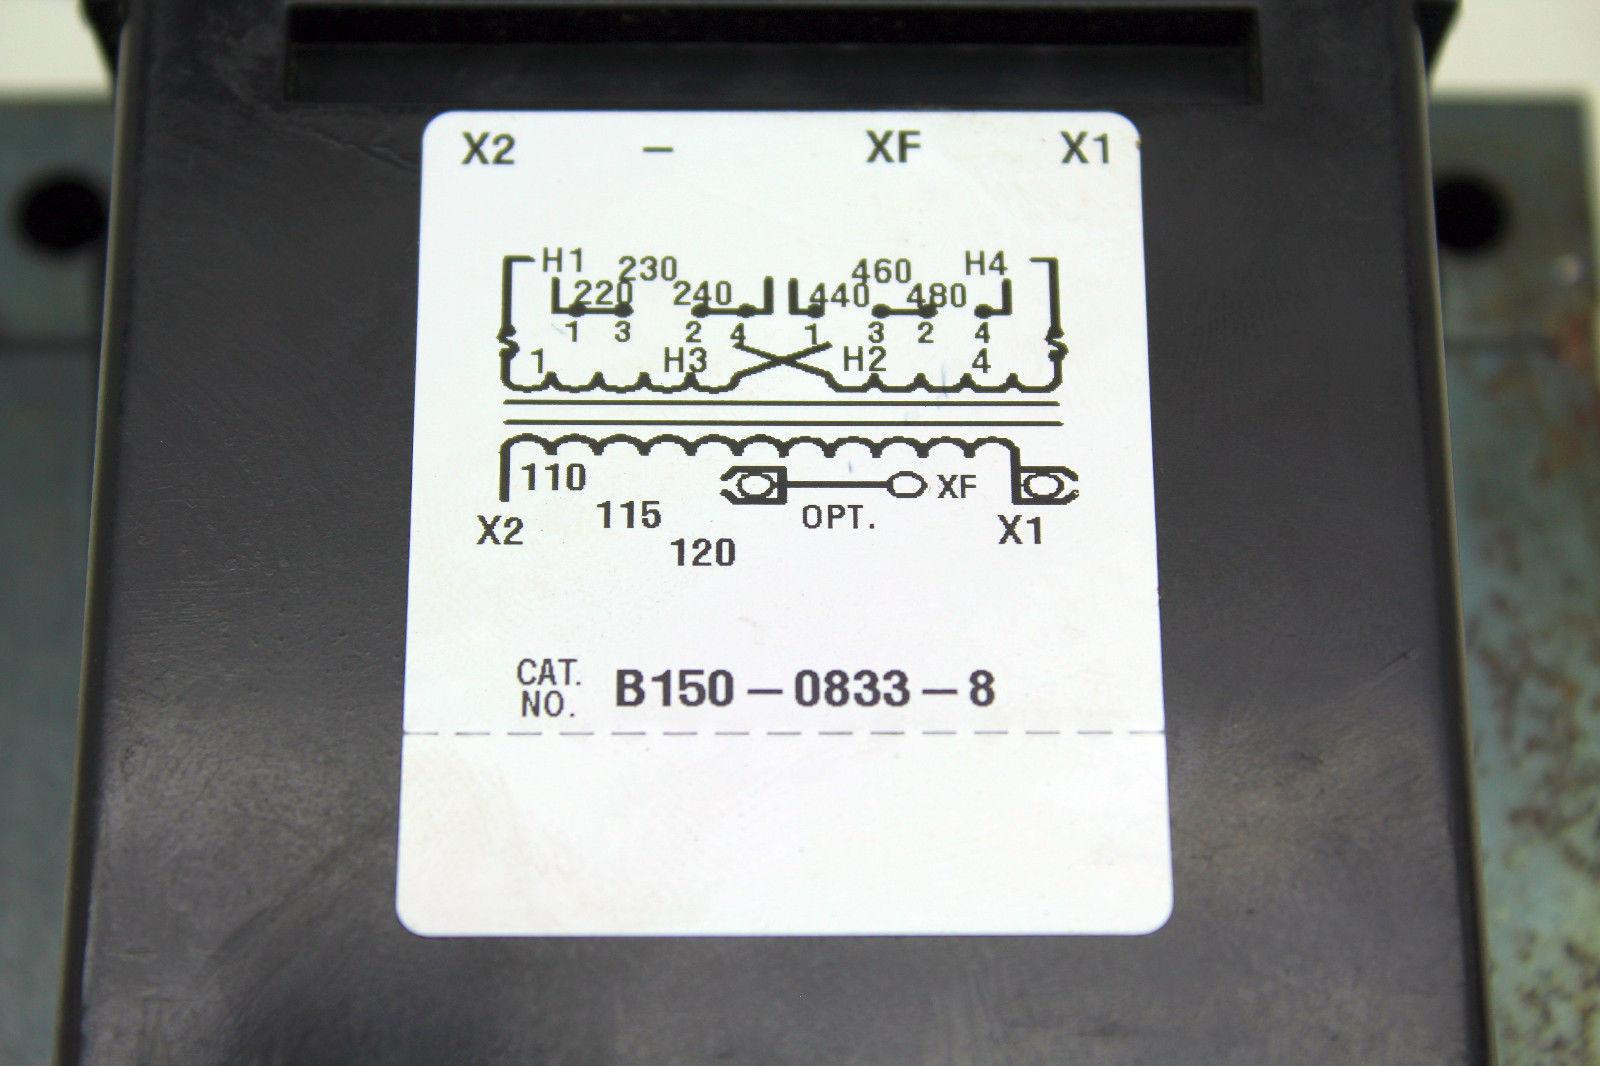 Square D Control Transformer Wiring Diagram Gandul 457779119 – John Deere Tractor Model 3120 Wiring Diagram 2007